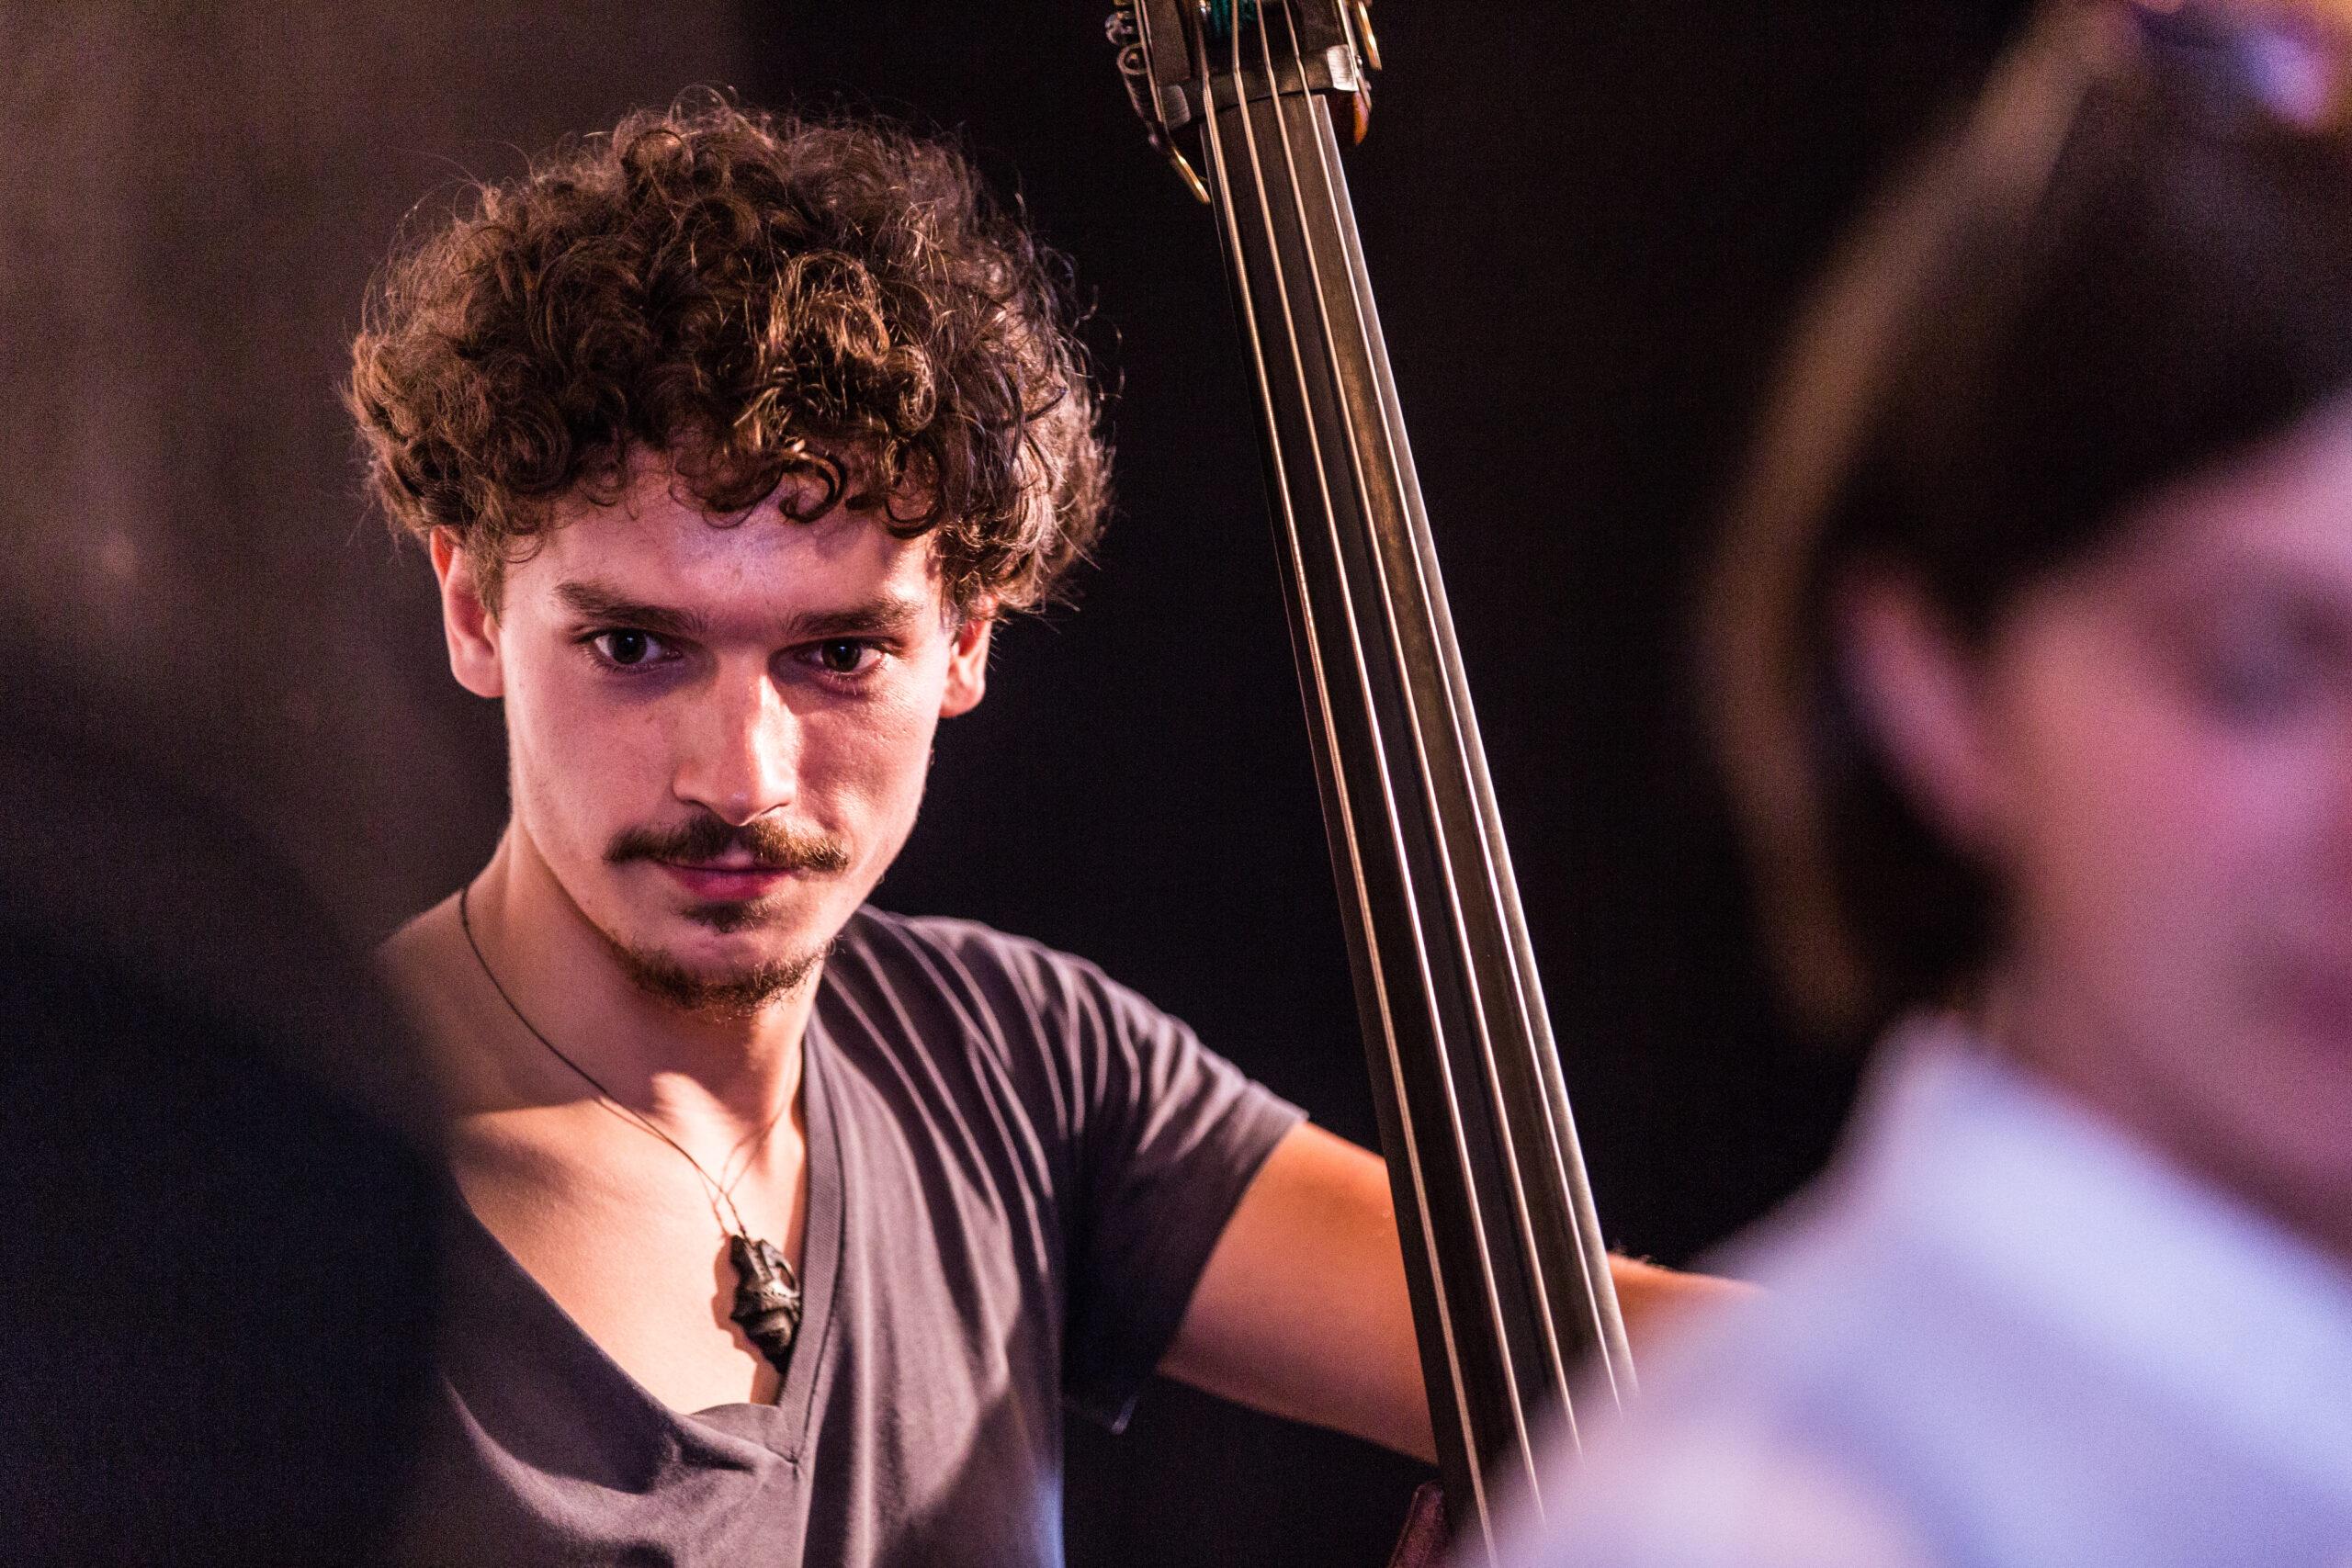 Cello Theaterkarawane